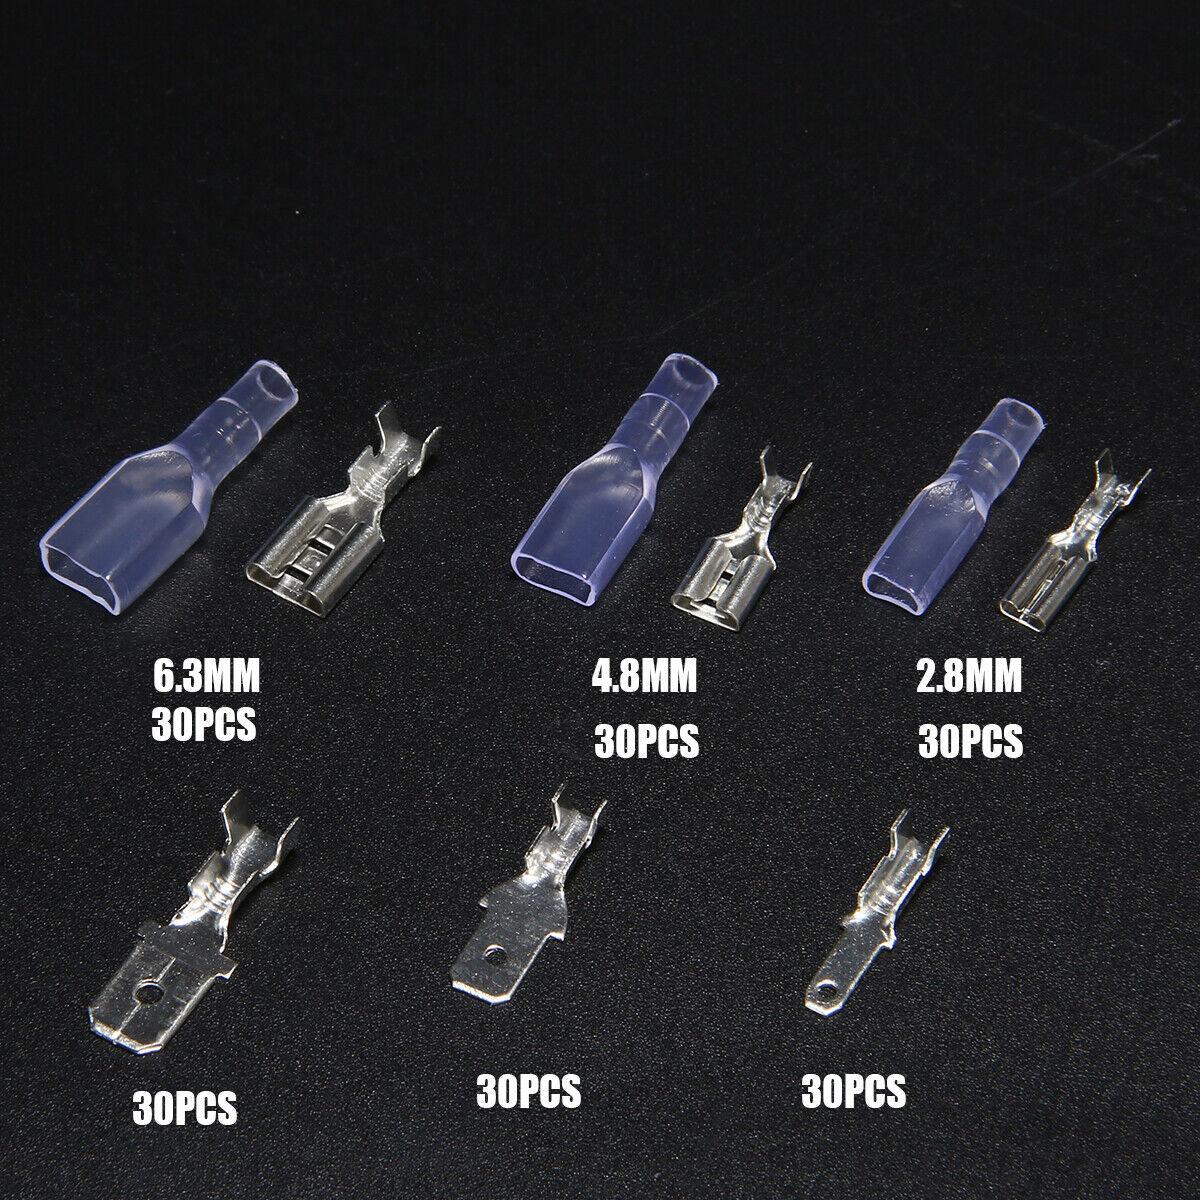 270pc Assortment Terminal Kit Electrical Wire Crimp Connectors Male Female Spade 7